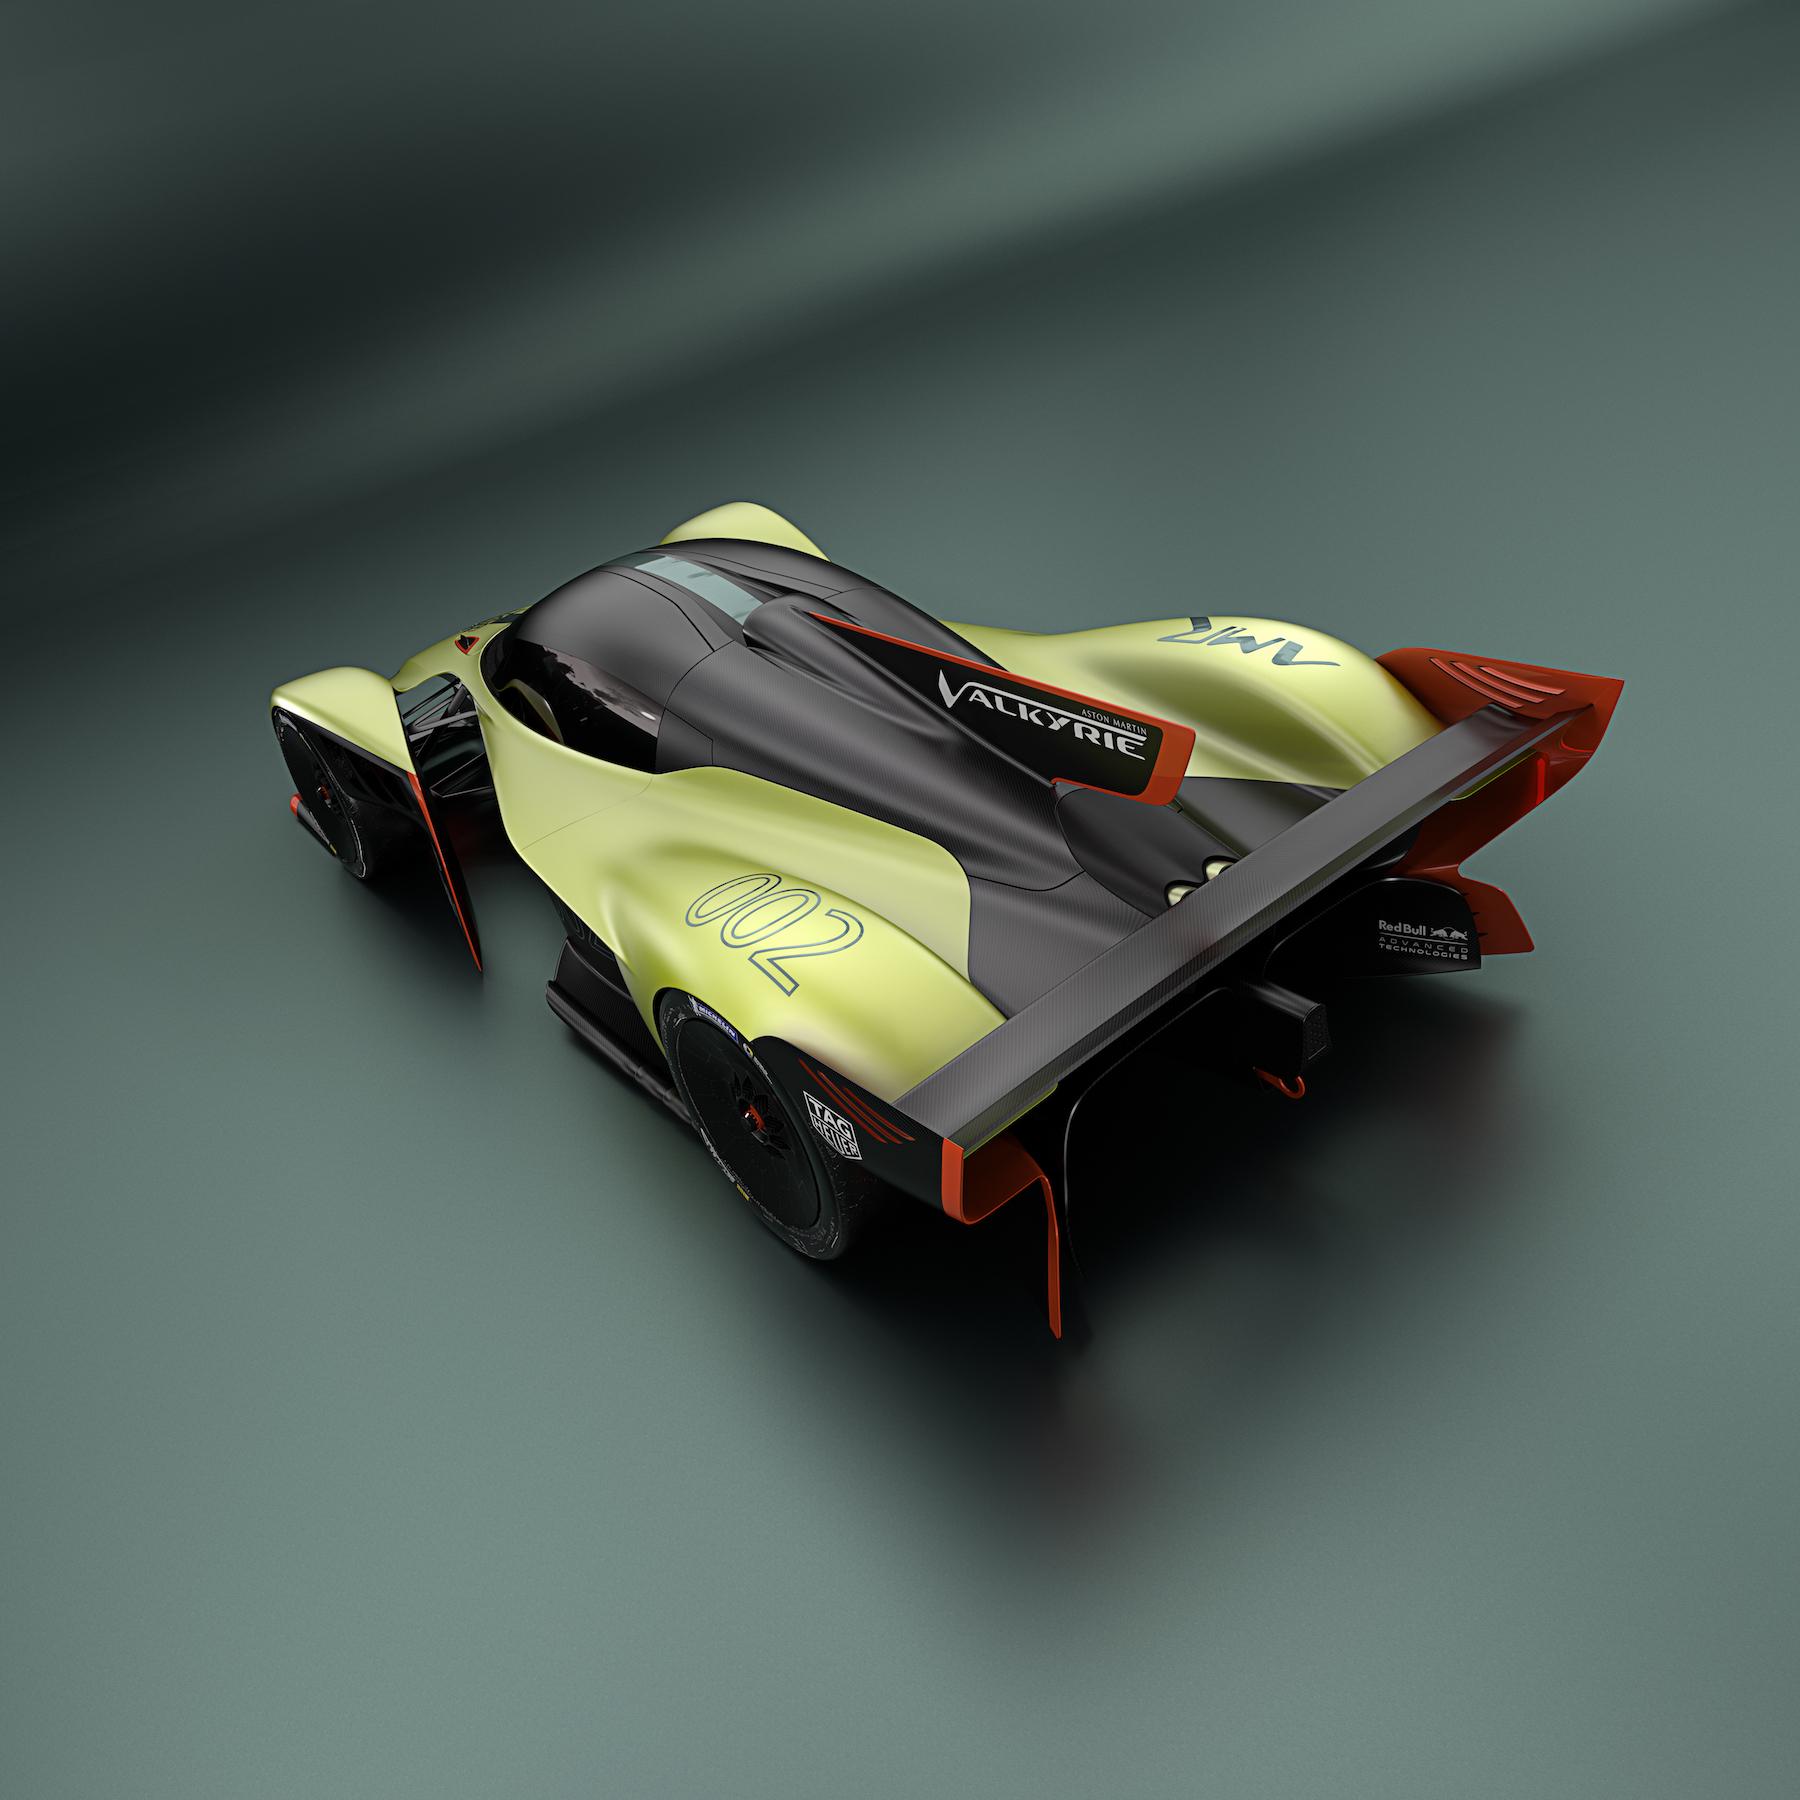 Valkyrie Car